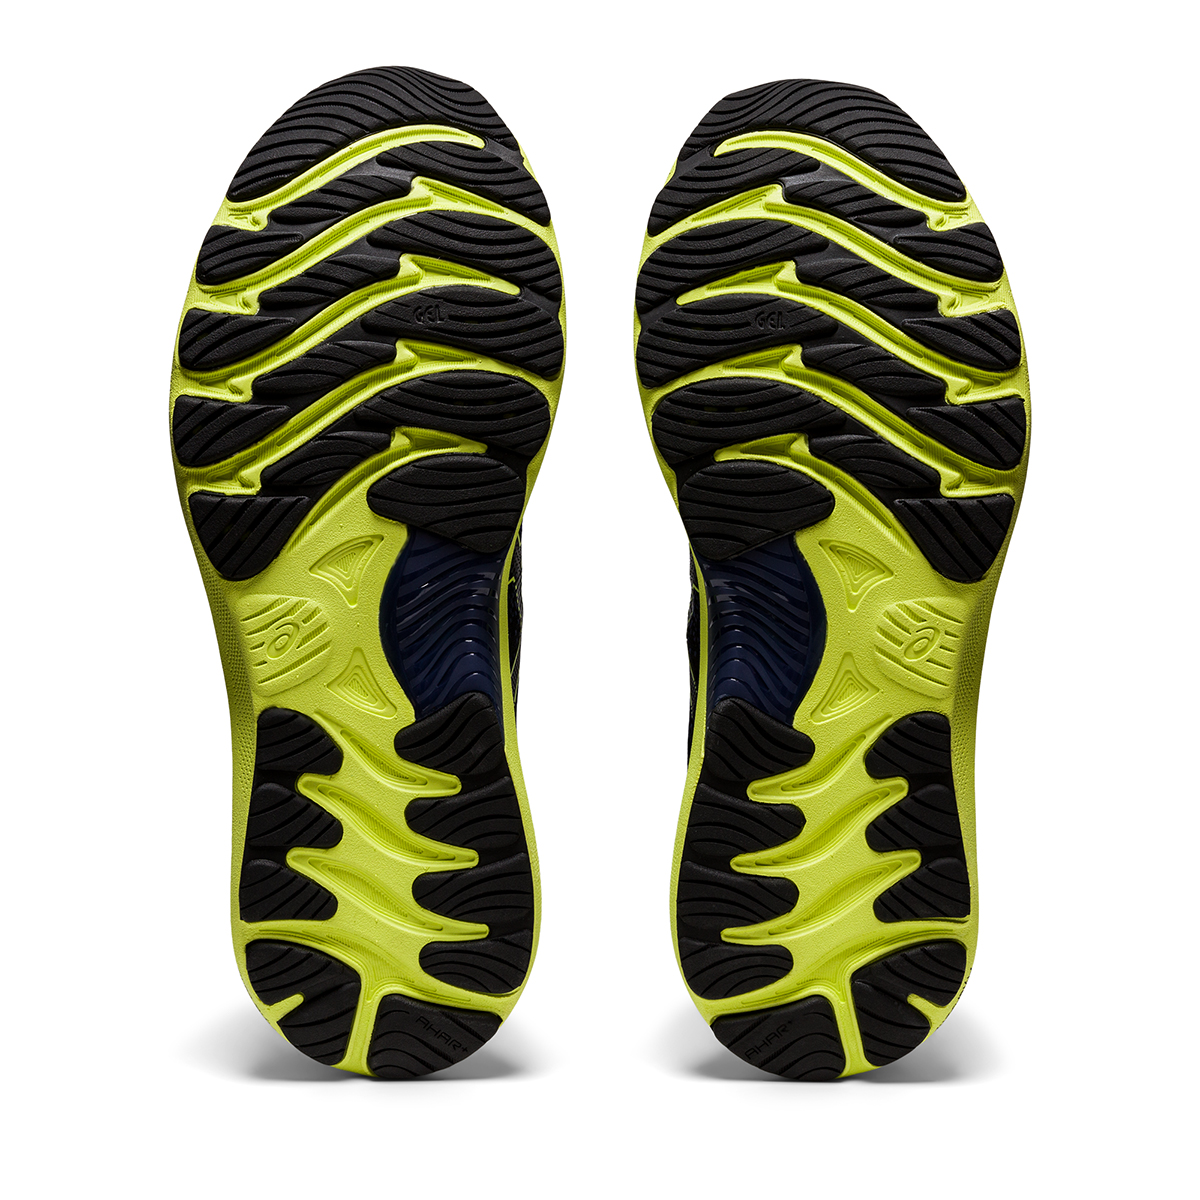 Men's Asics Gel-Nimbus 23 Running Shoe - Color: Thunder Blue - Size: 7 - Width: Regular, Thunder Blue, large, image 6